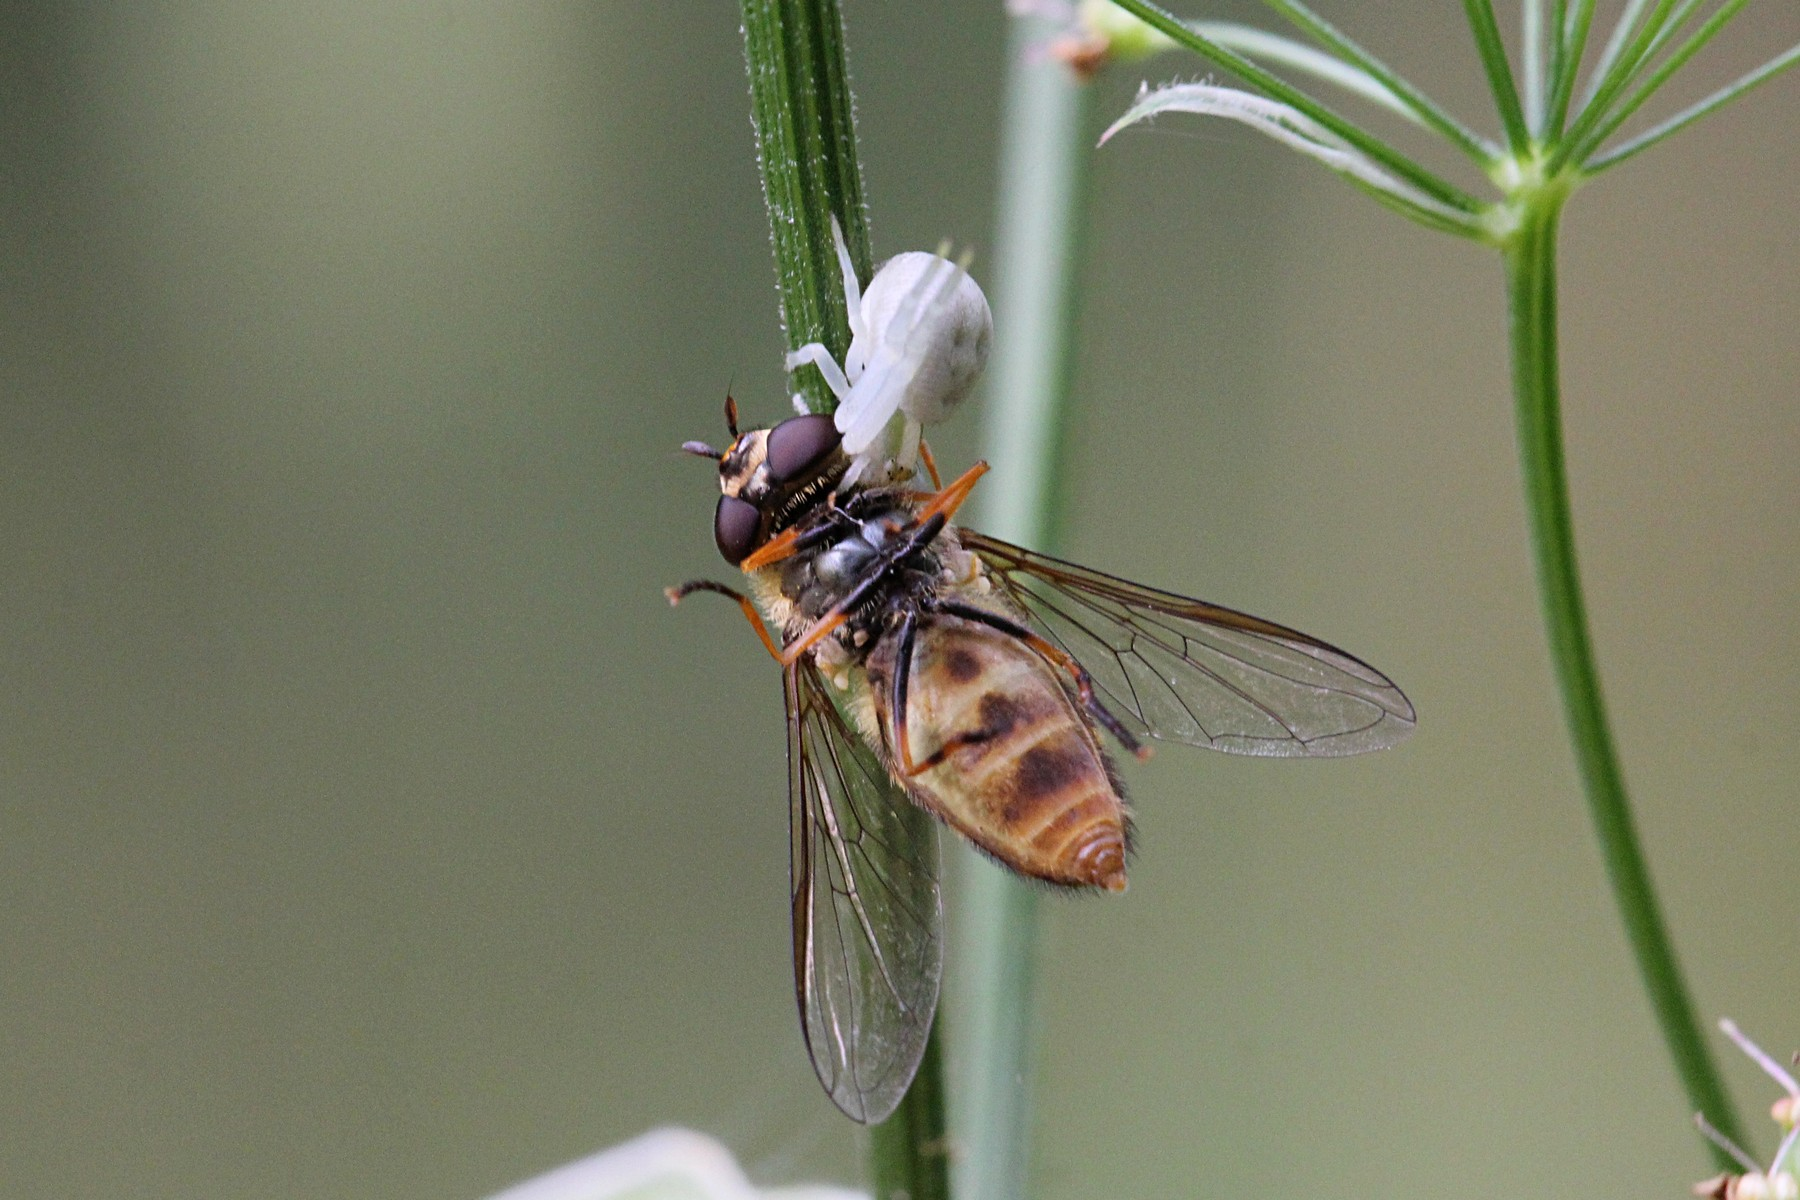 Воздушный балет: как белый цветочный паук муху-журчалку поймал